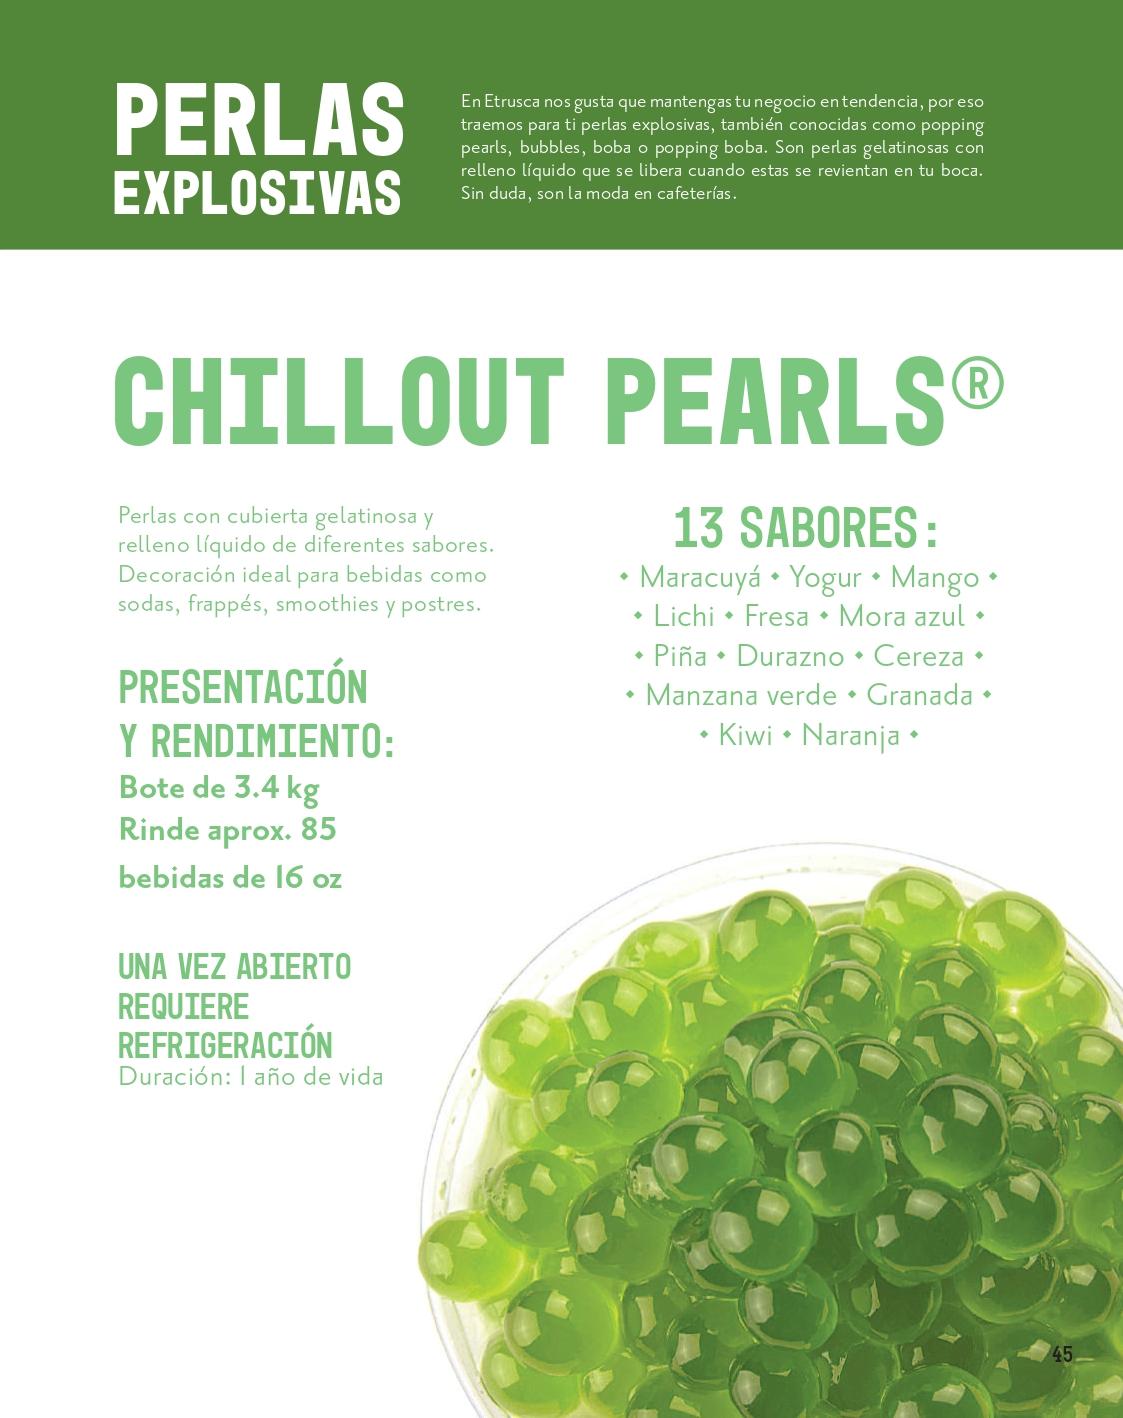 Perlas Explosivas